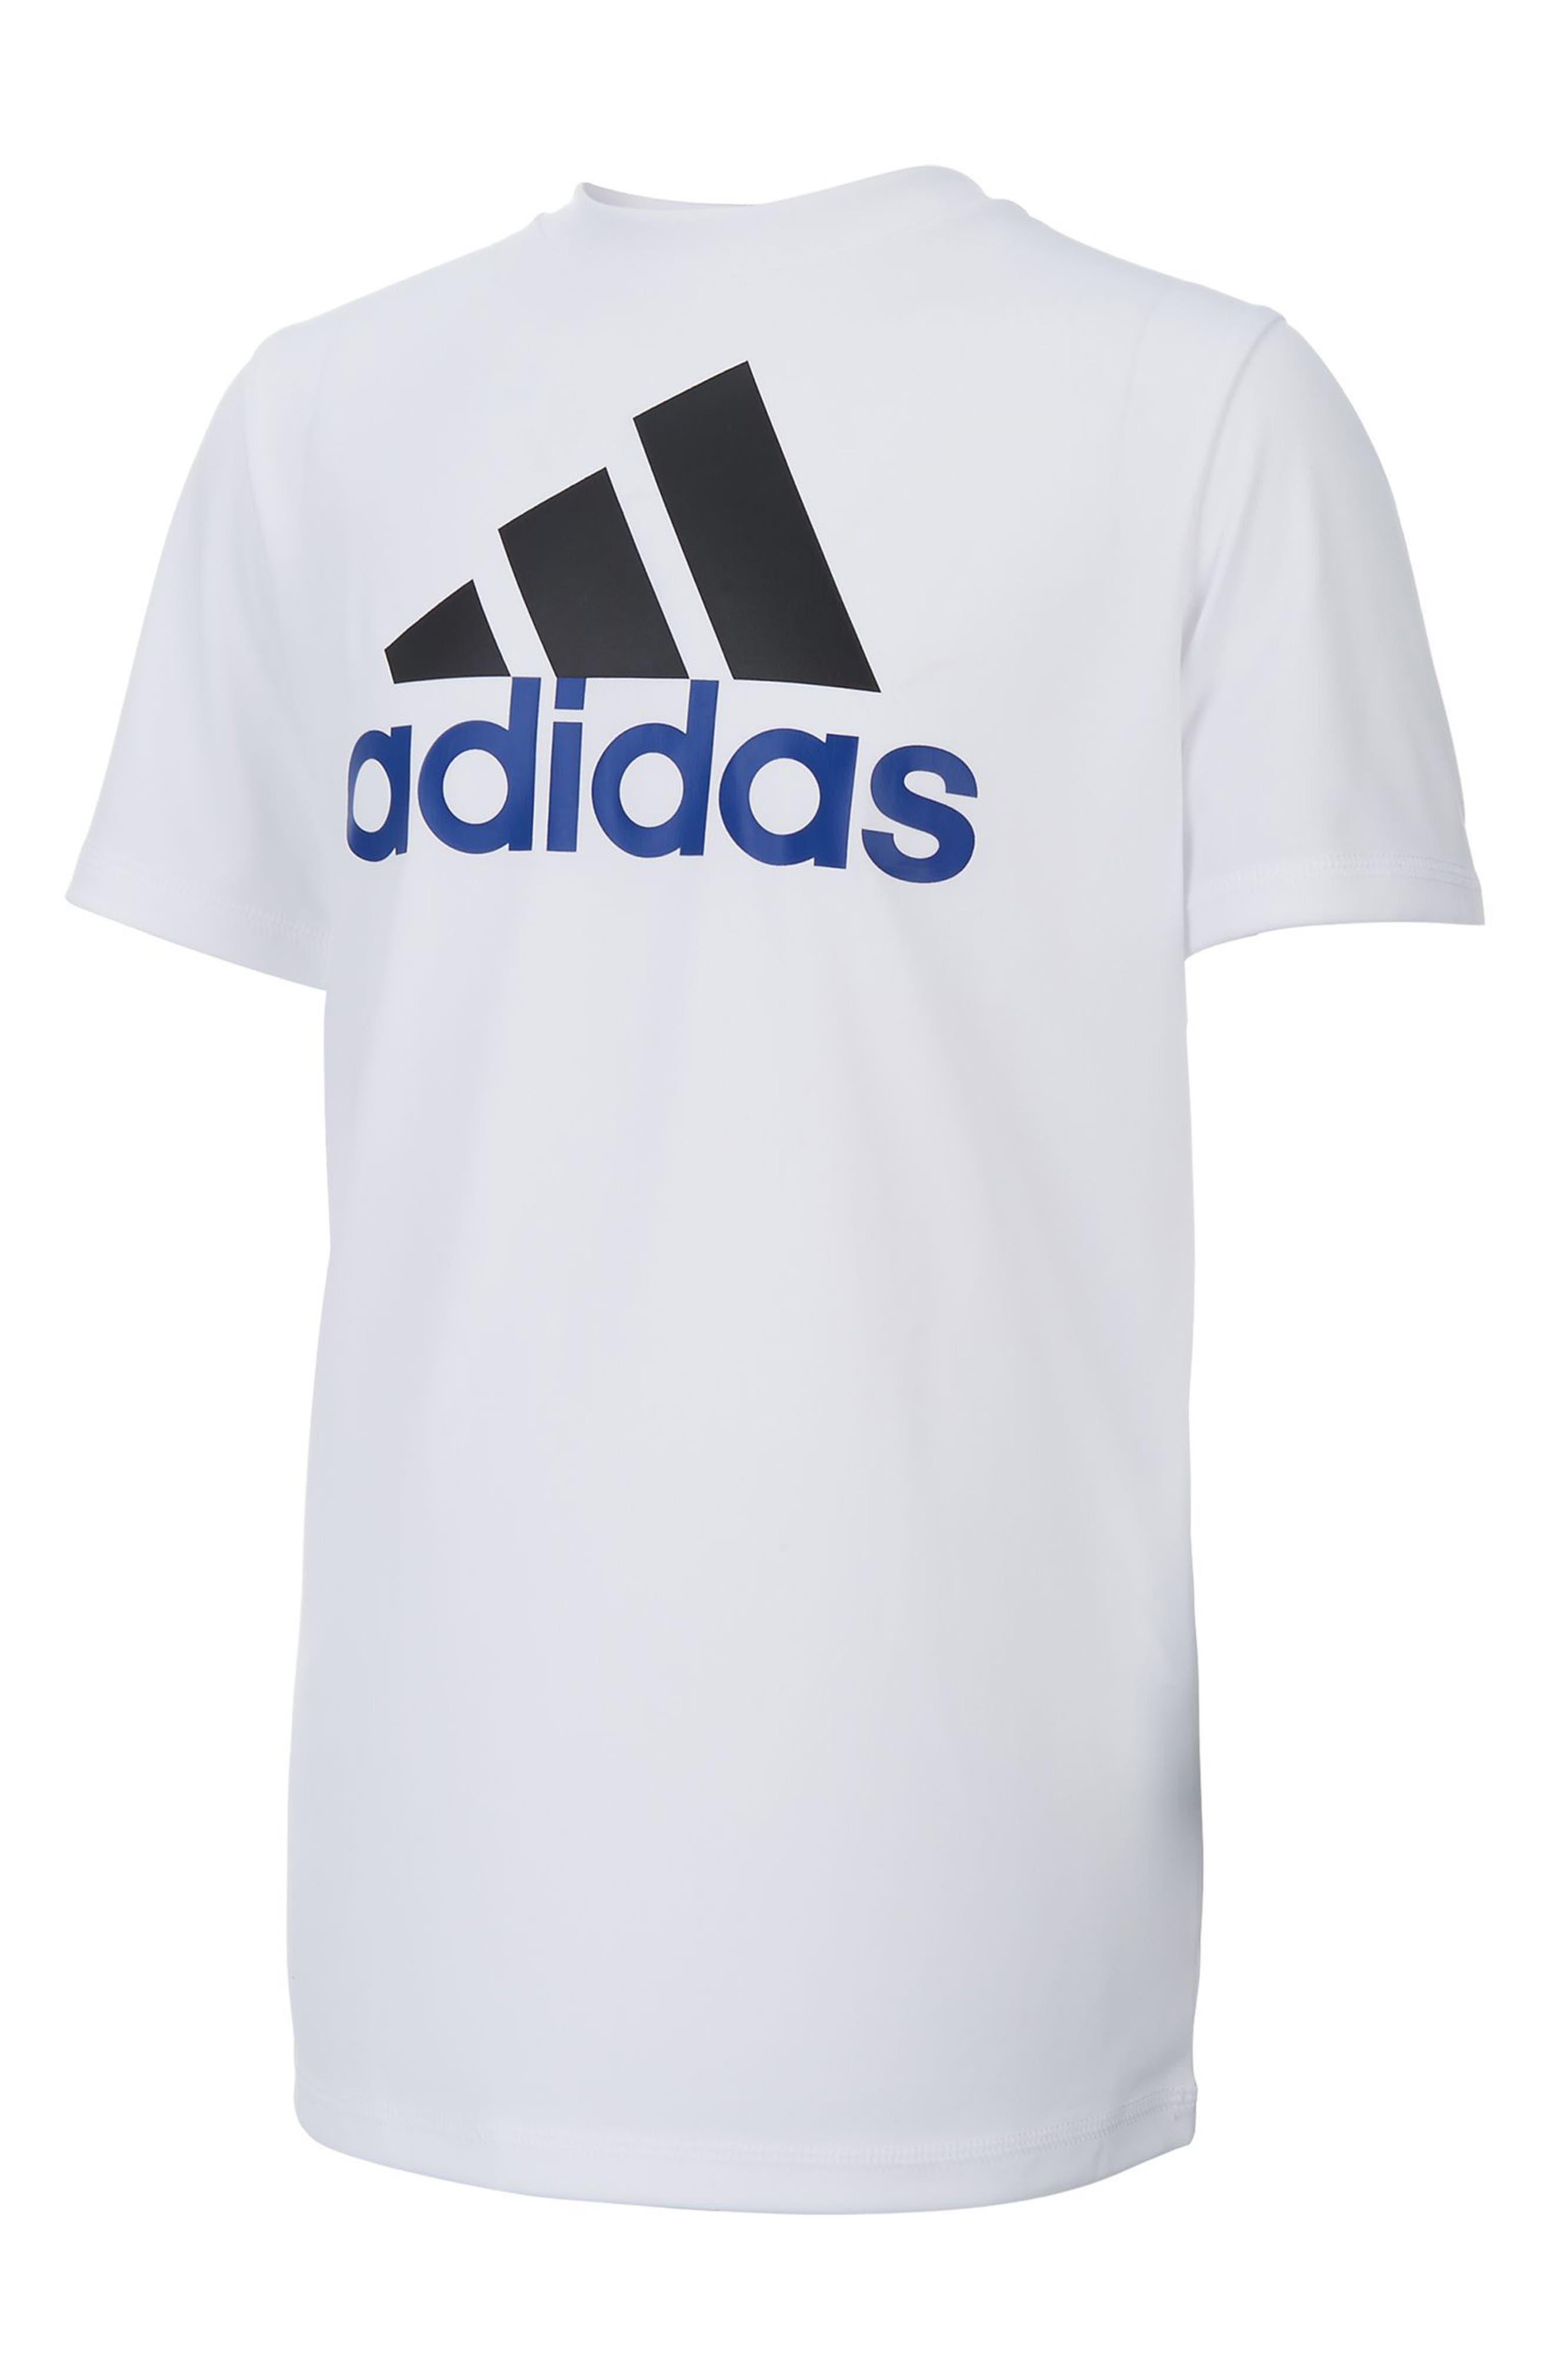 adidas Replenish Climalite® T-Shirt (Big Boys)